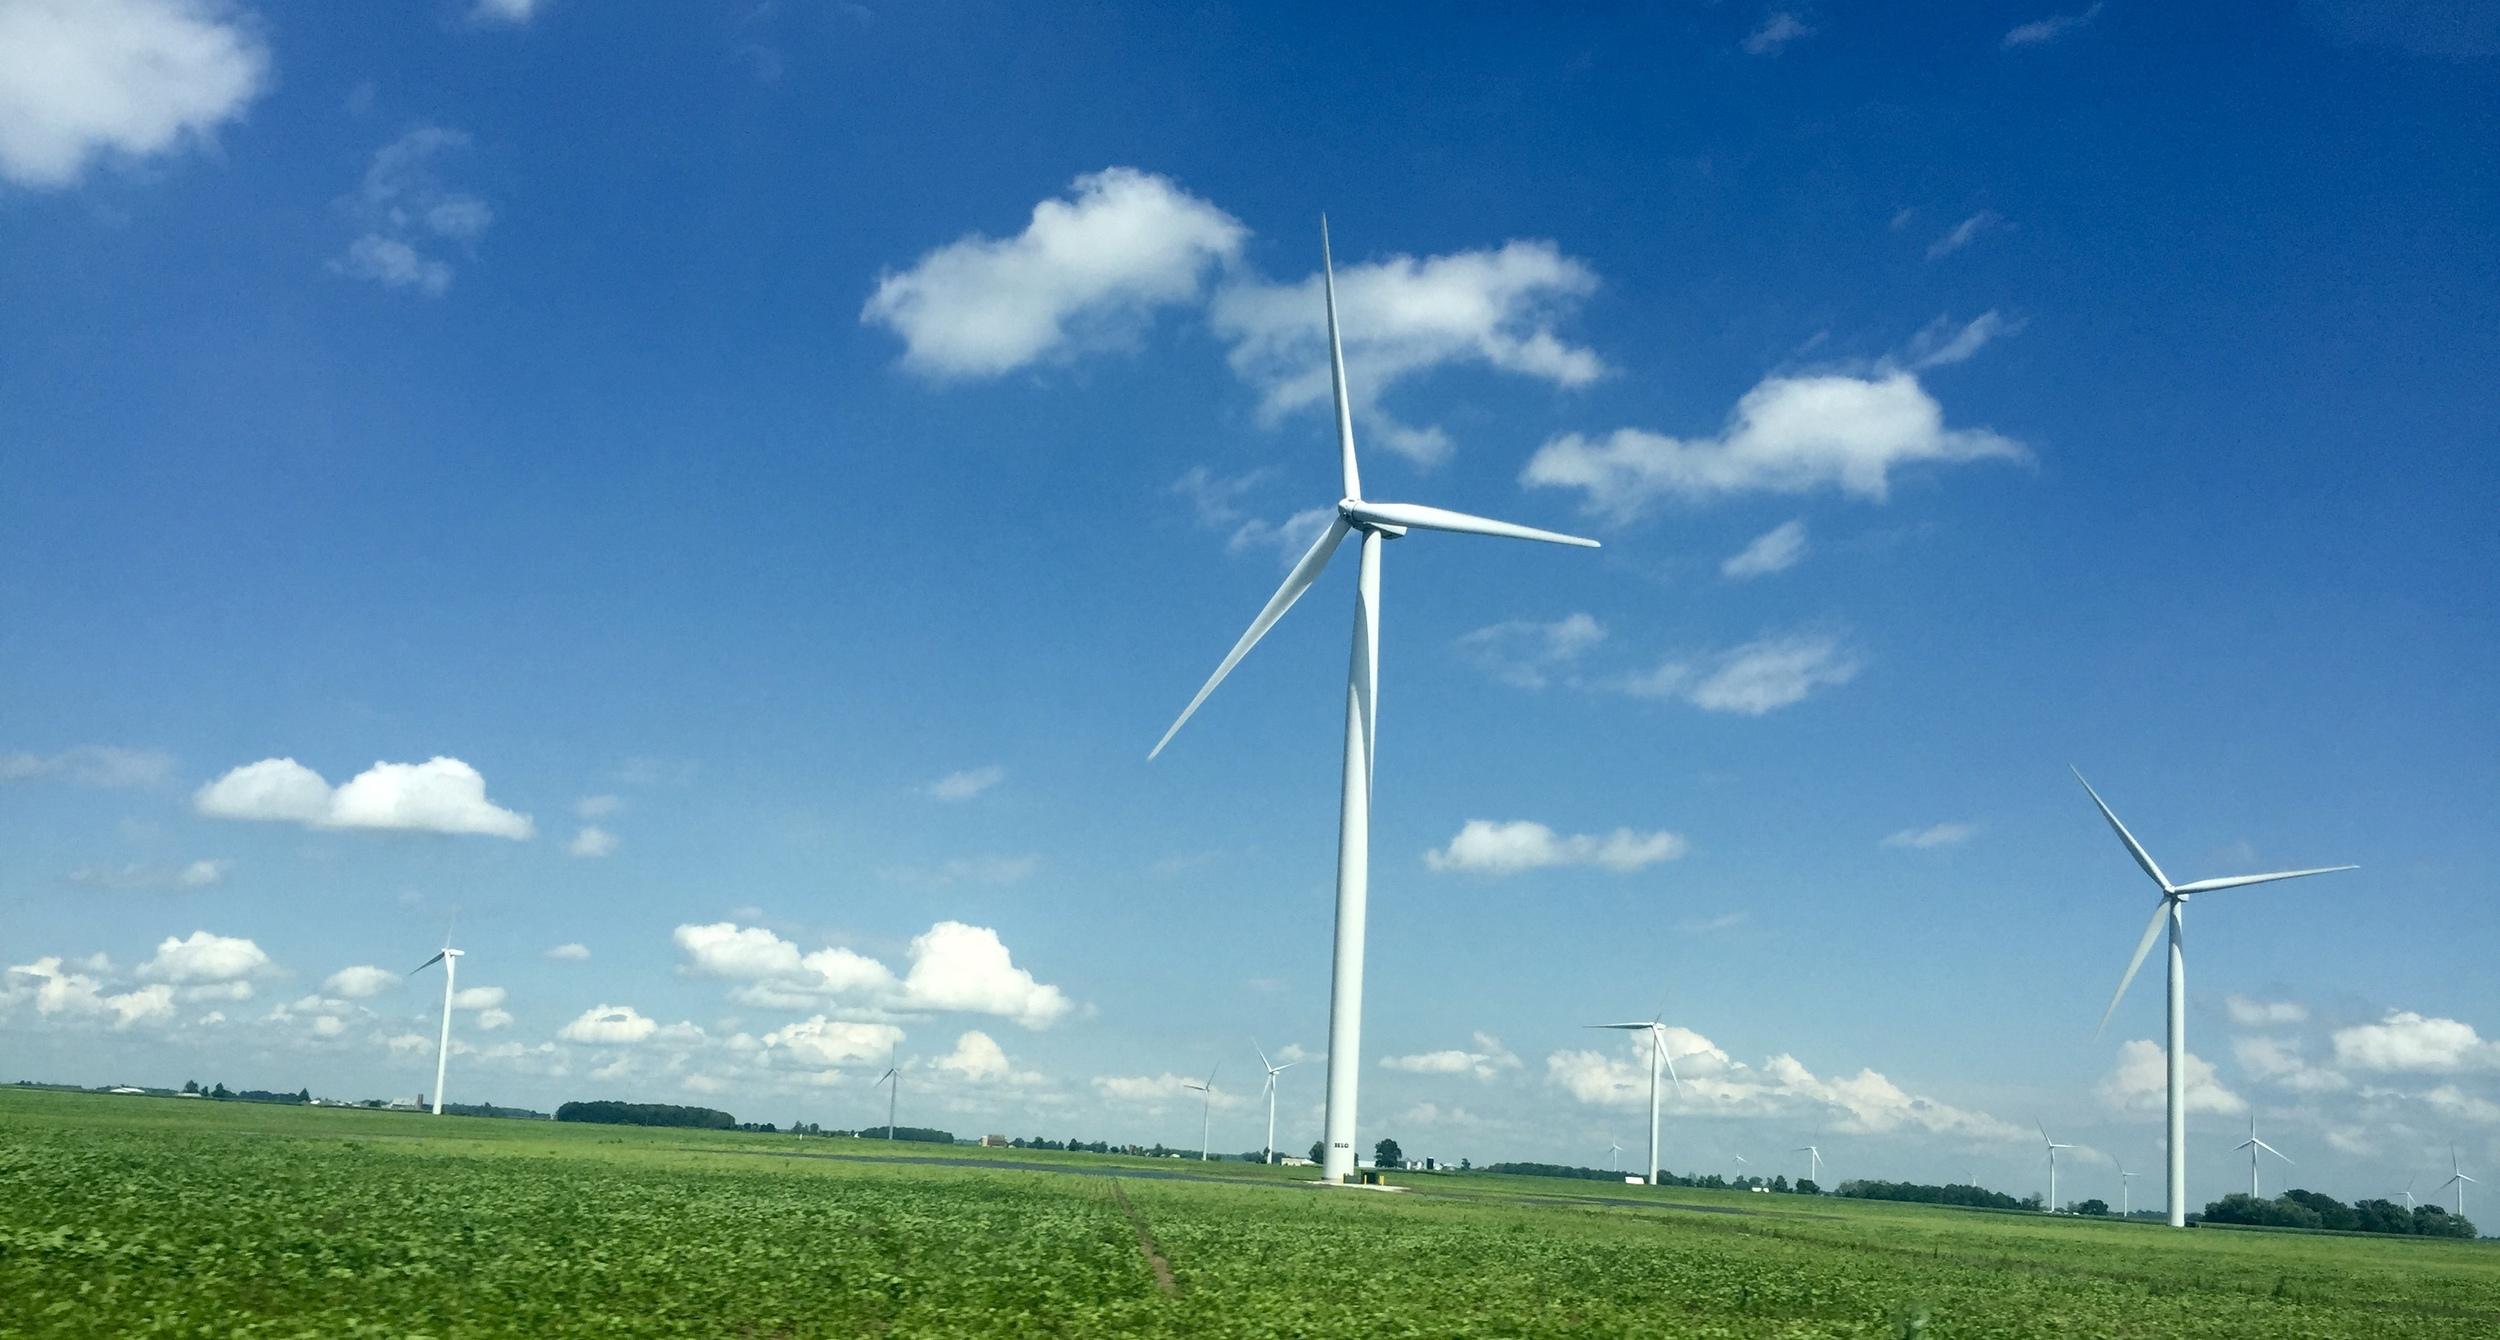 Rural Indiana is beautiful.